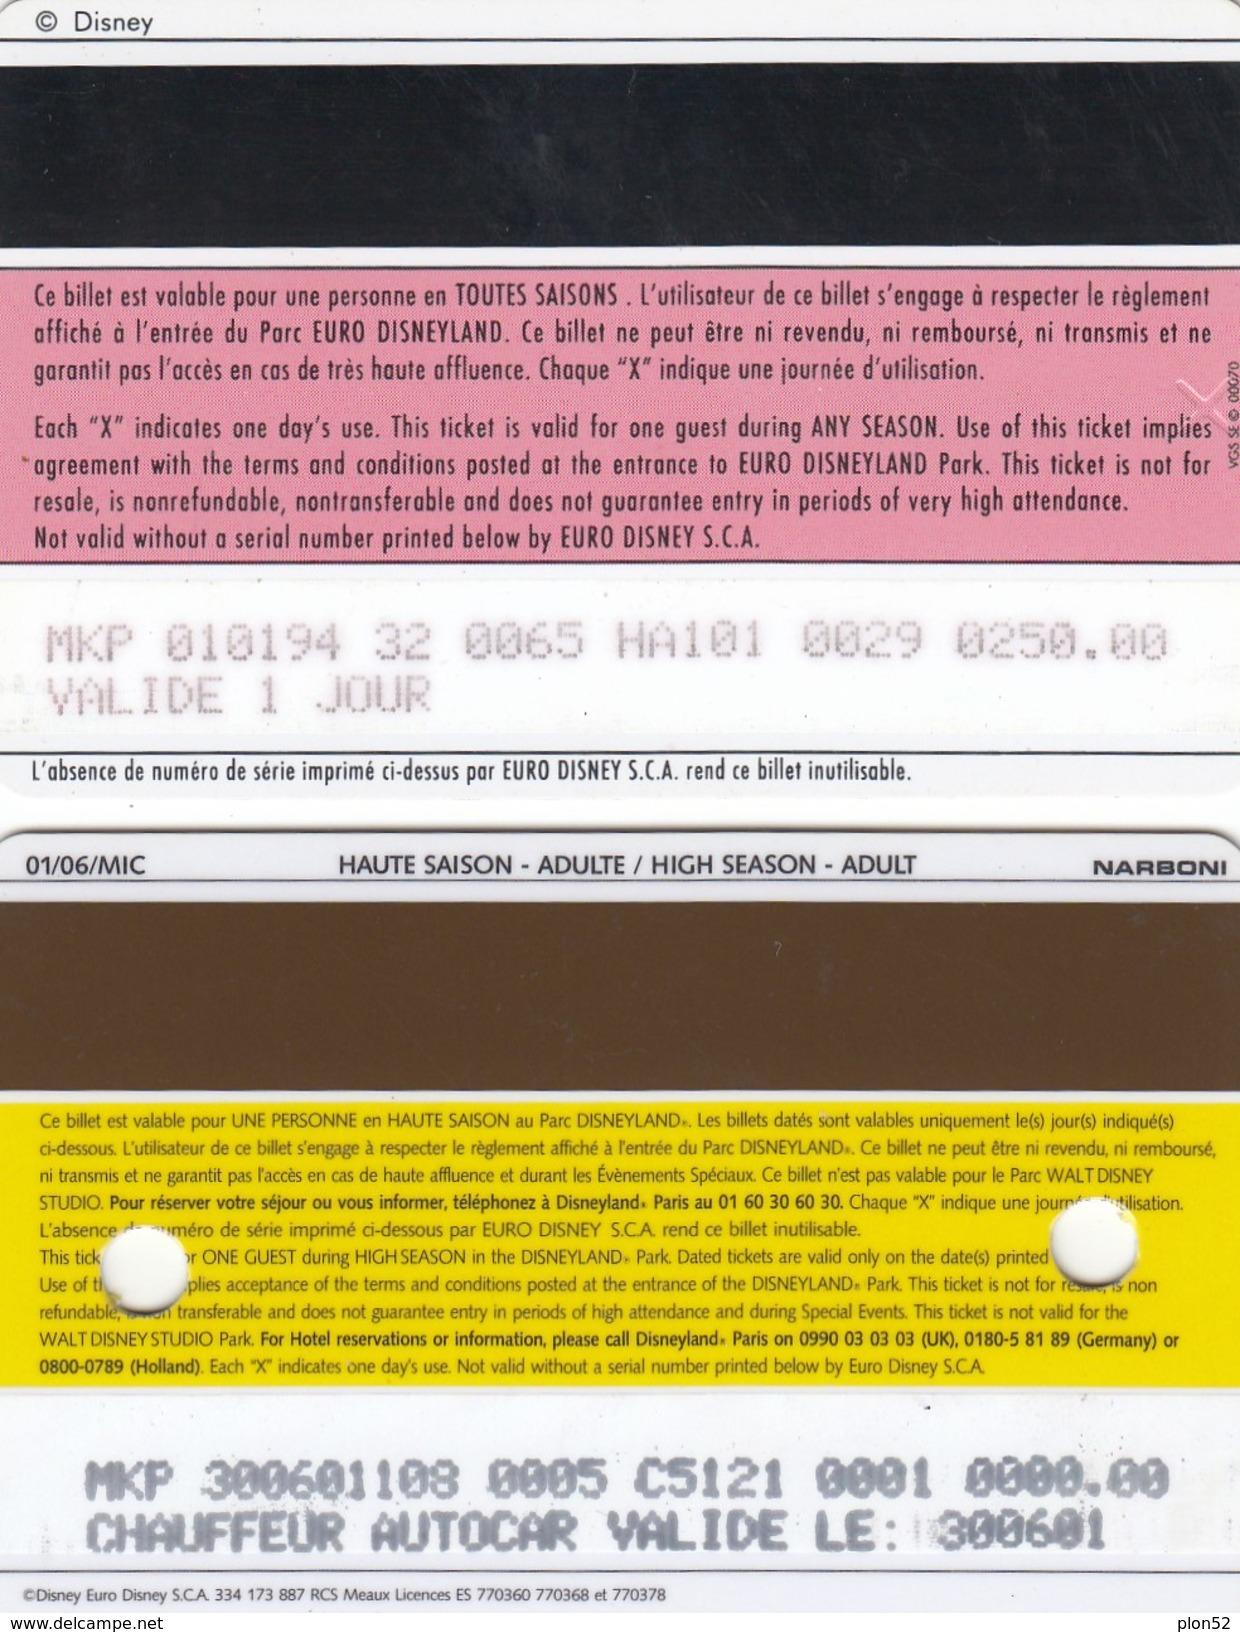 11160-N. 2 BIGLIETTI INGRESSO DISNEYLAND-USATI - Biglietti D'ingresso